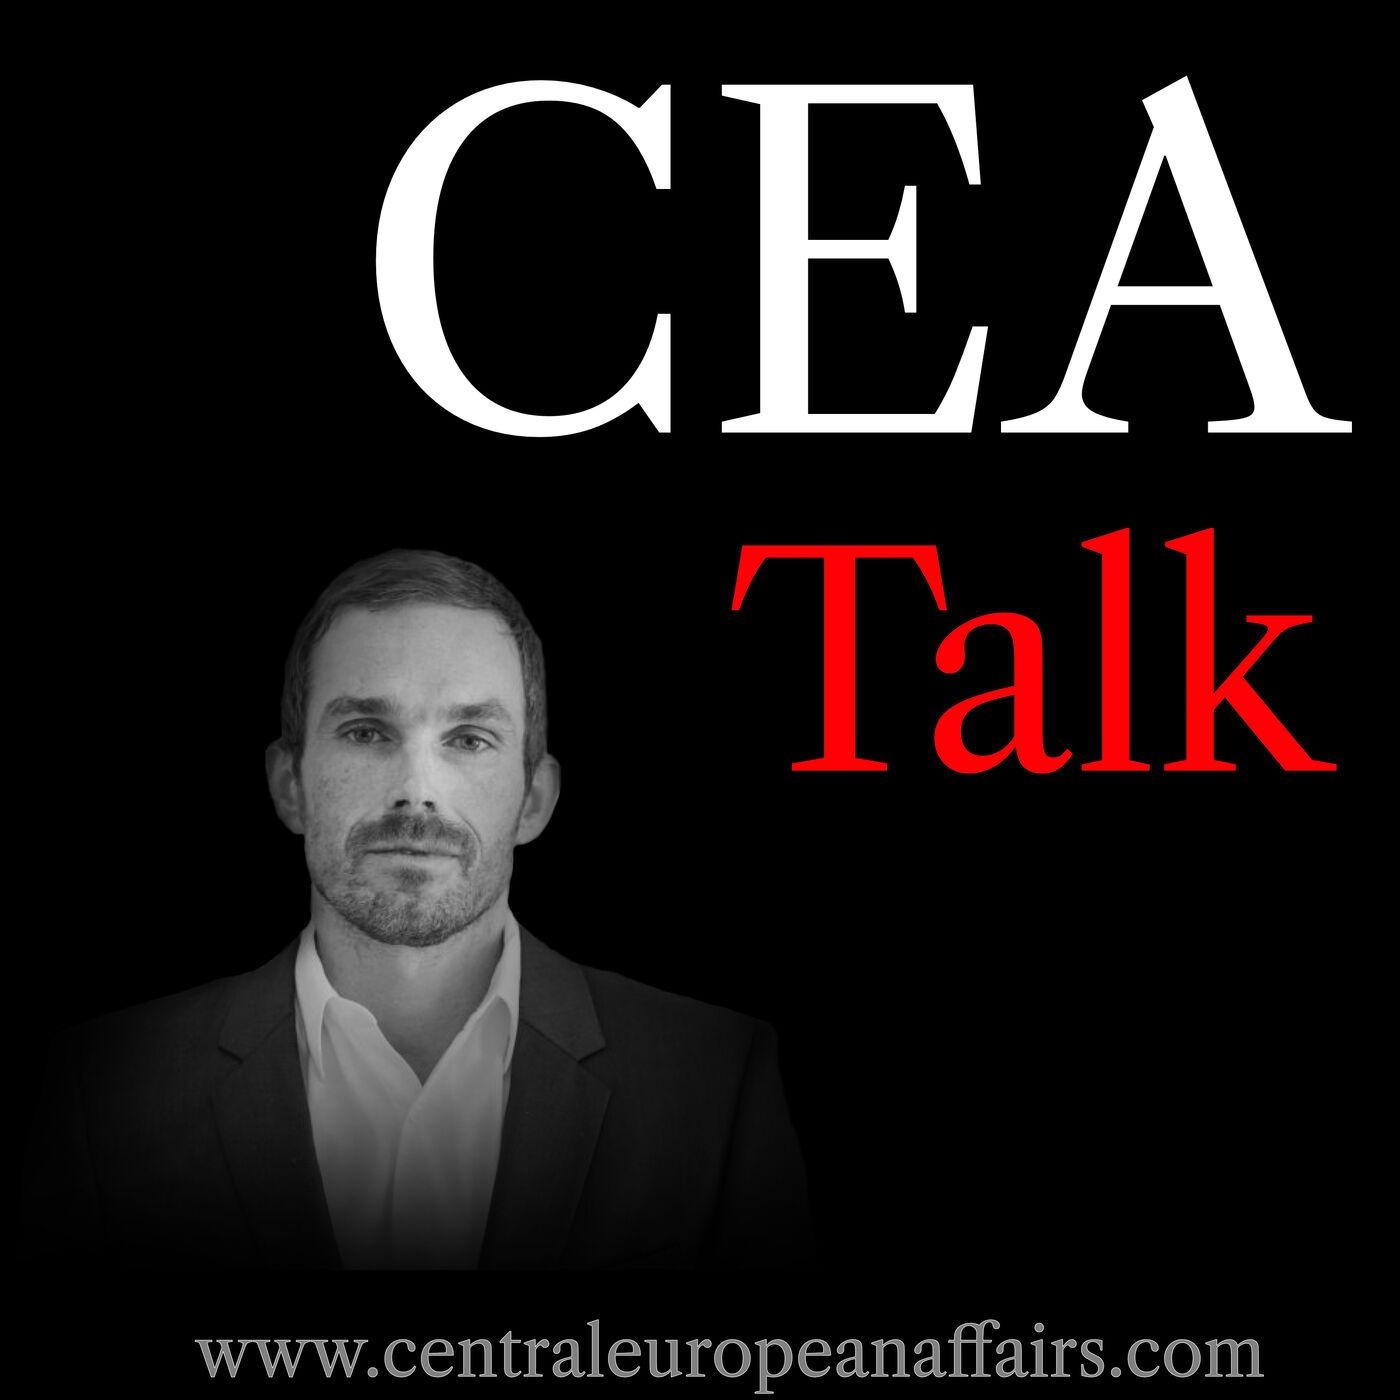 Benner: Angela Merkel is the weakest link on China